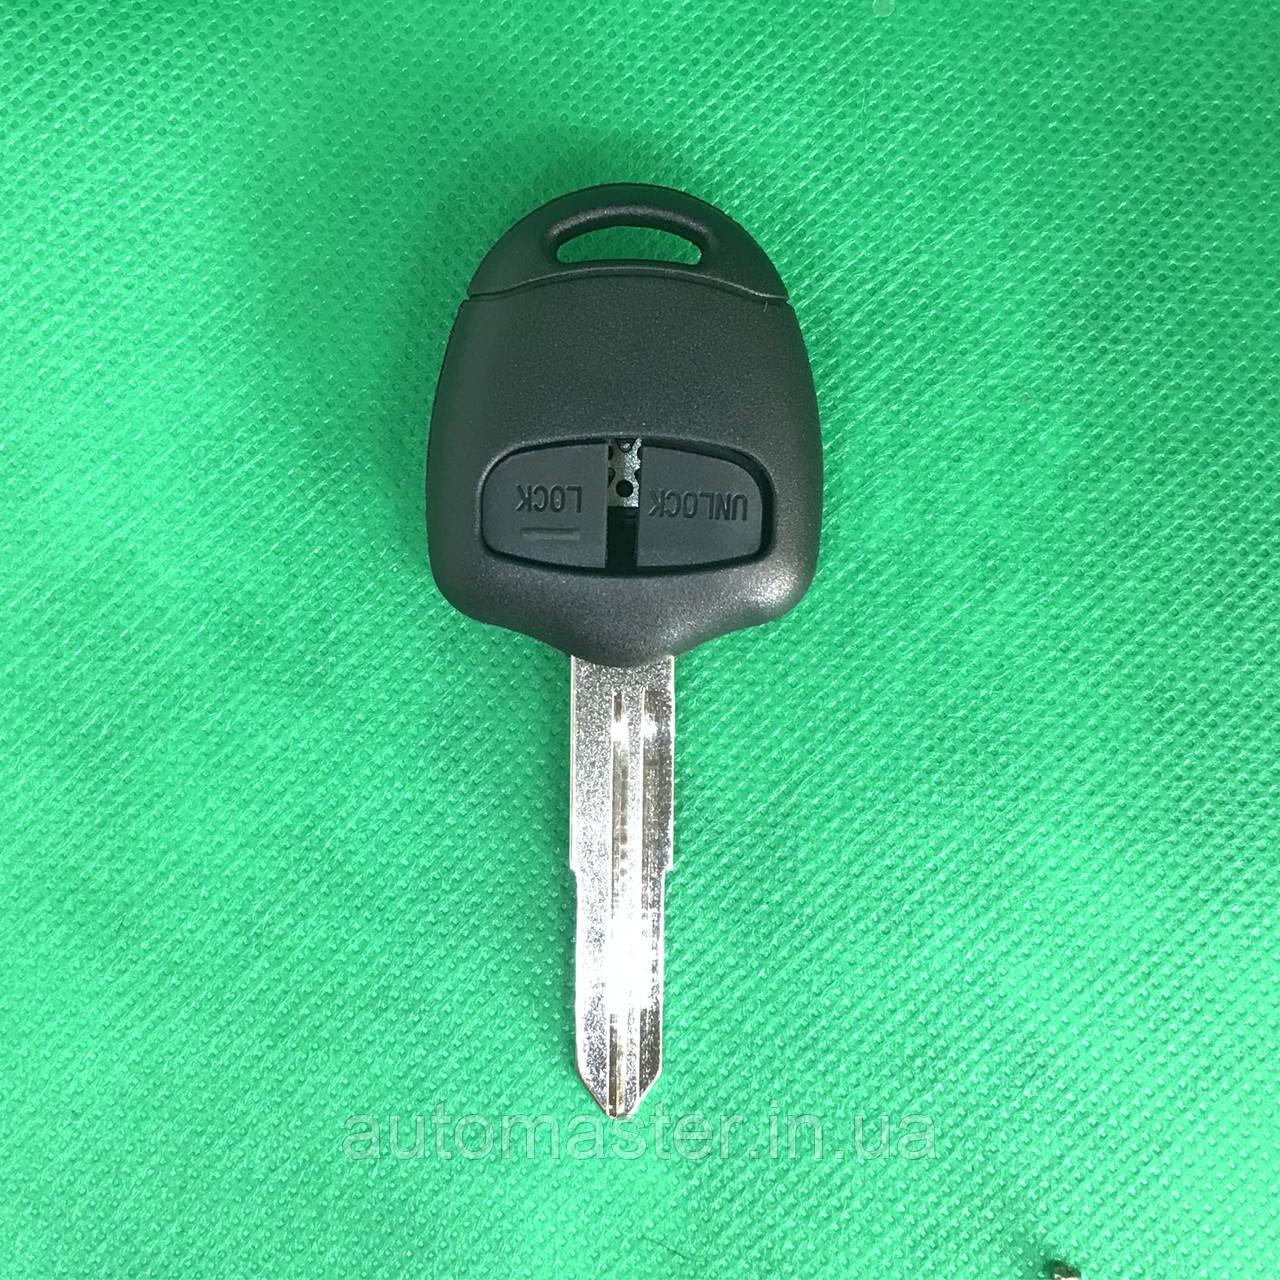 Корпус ключ MITSUBISHI (Міцубісі) Lancer, Outlander 2 - кнопки